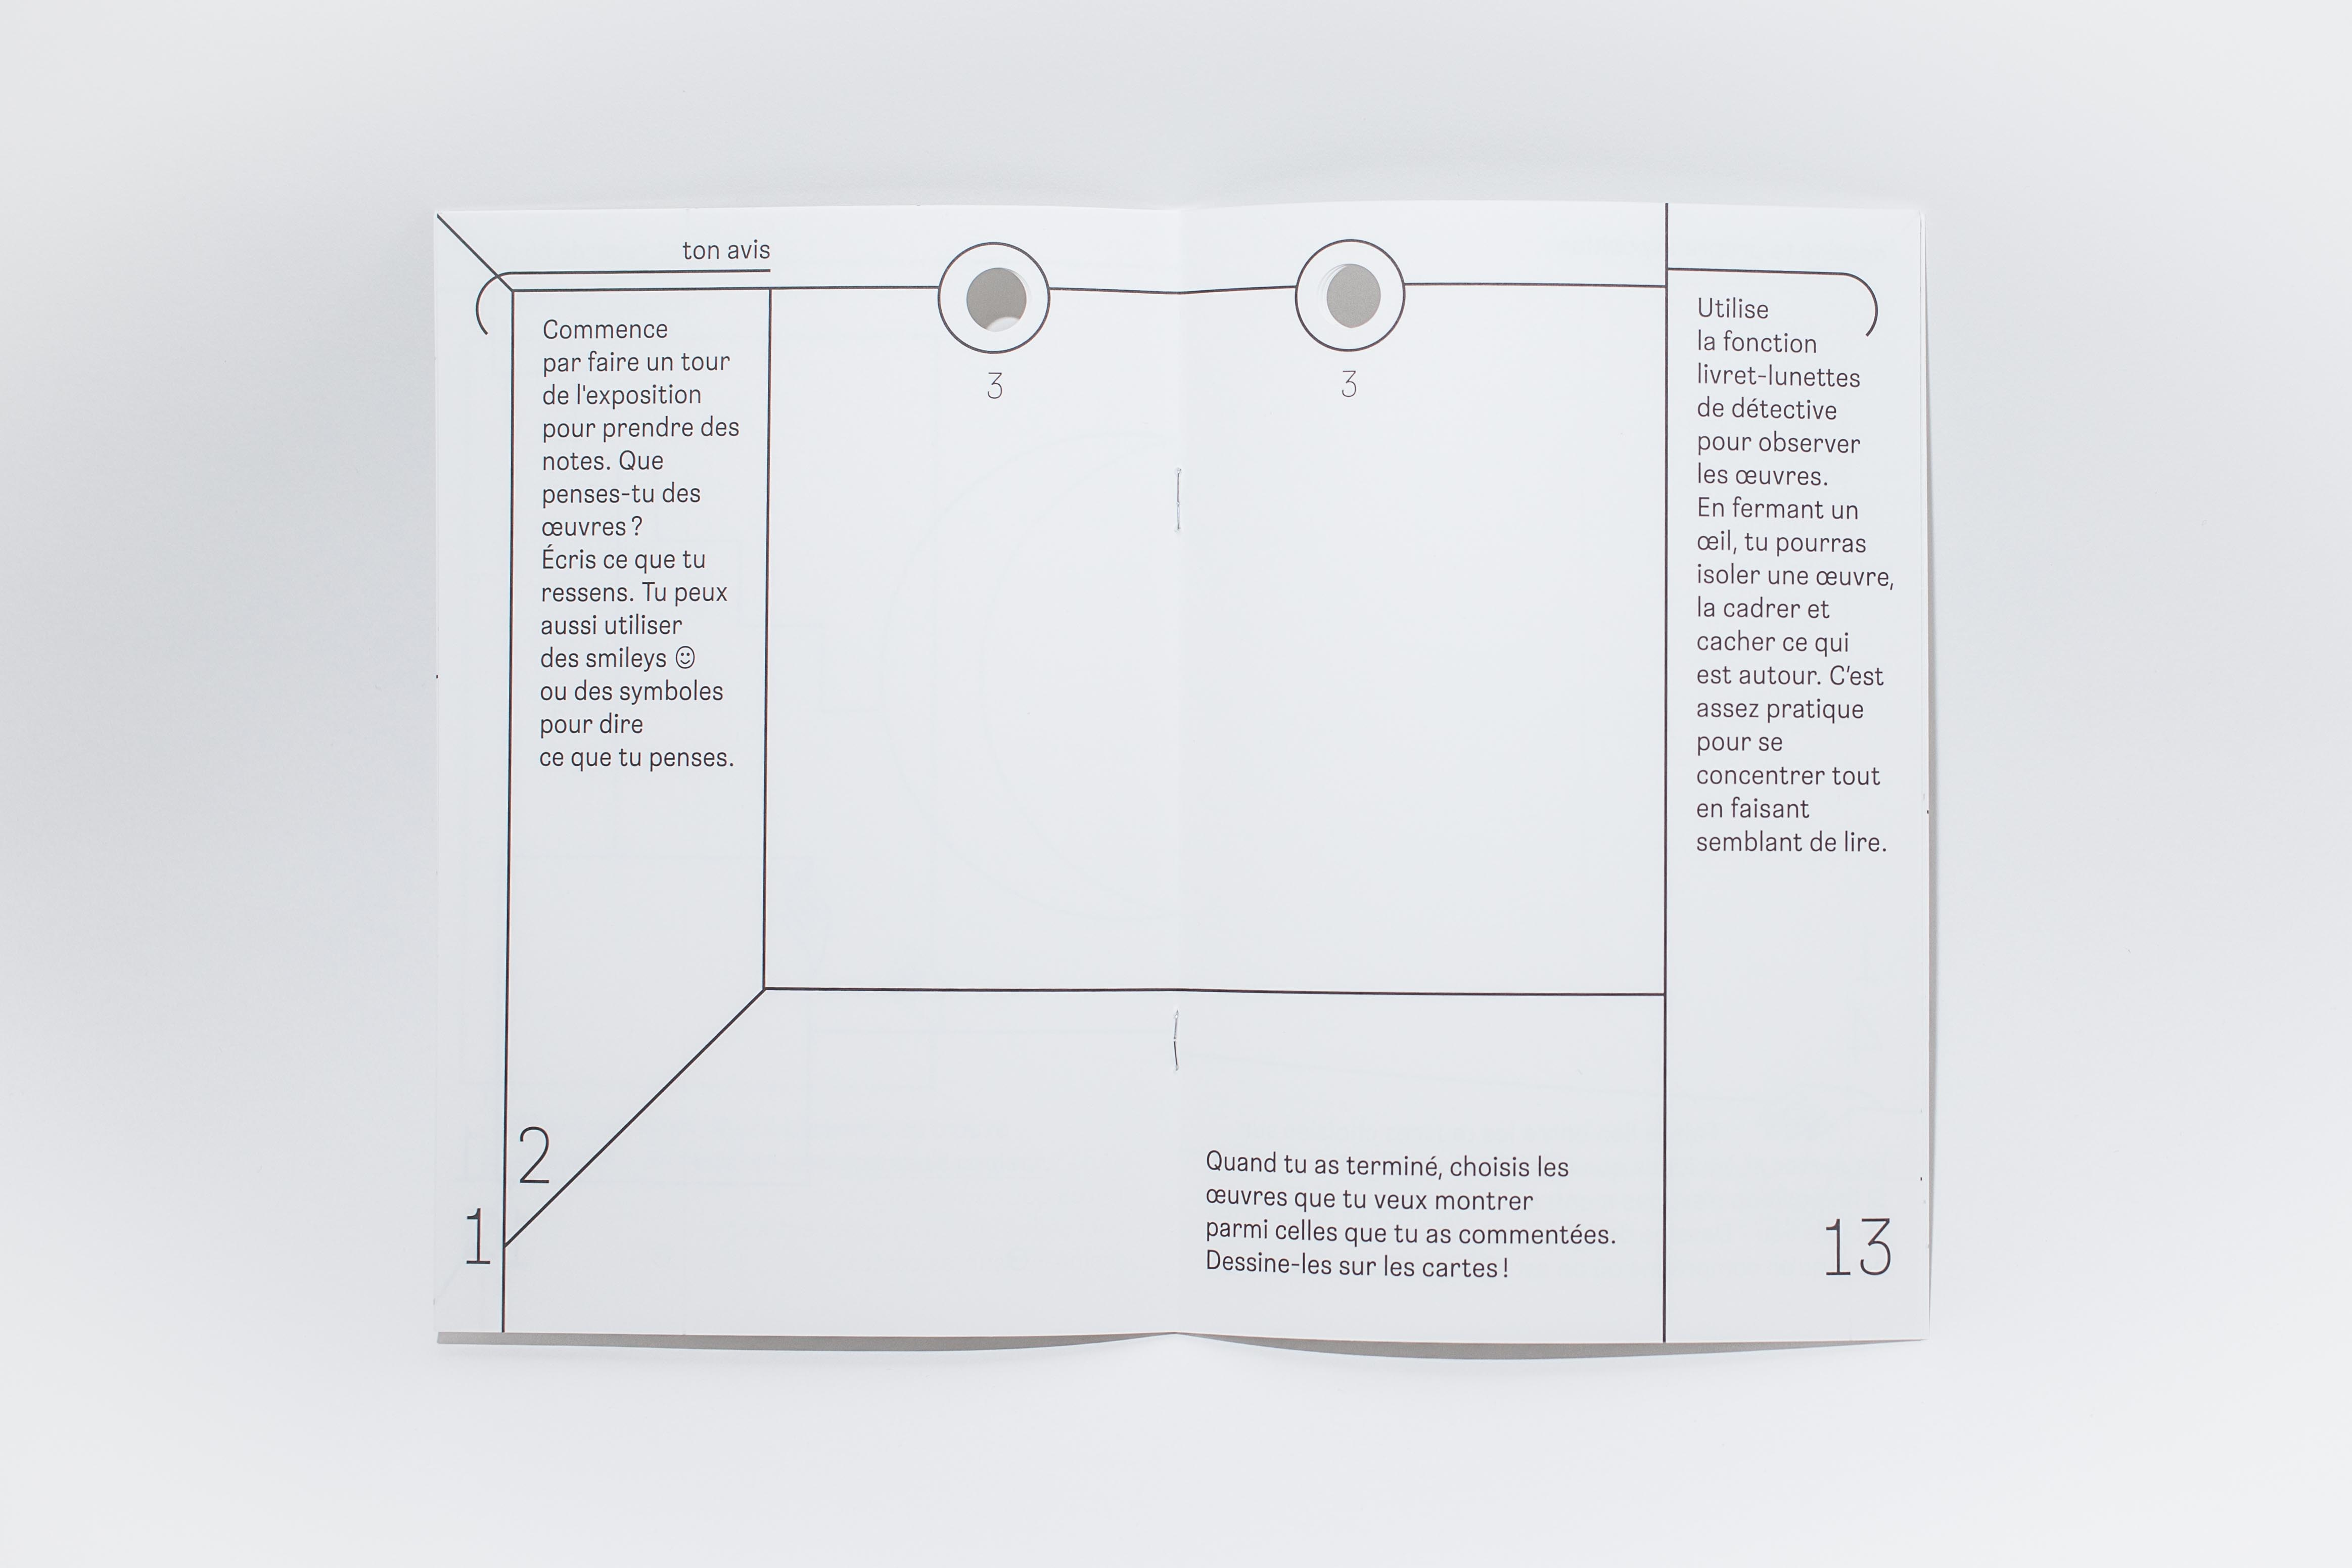 image apropos 7 - Index